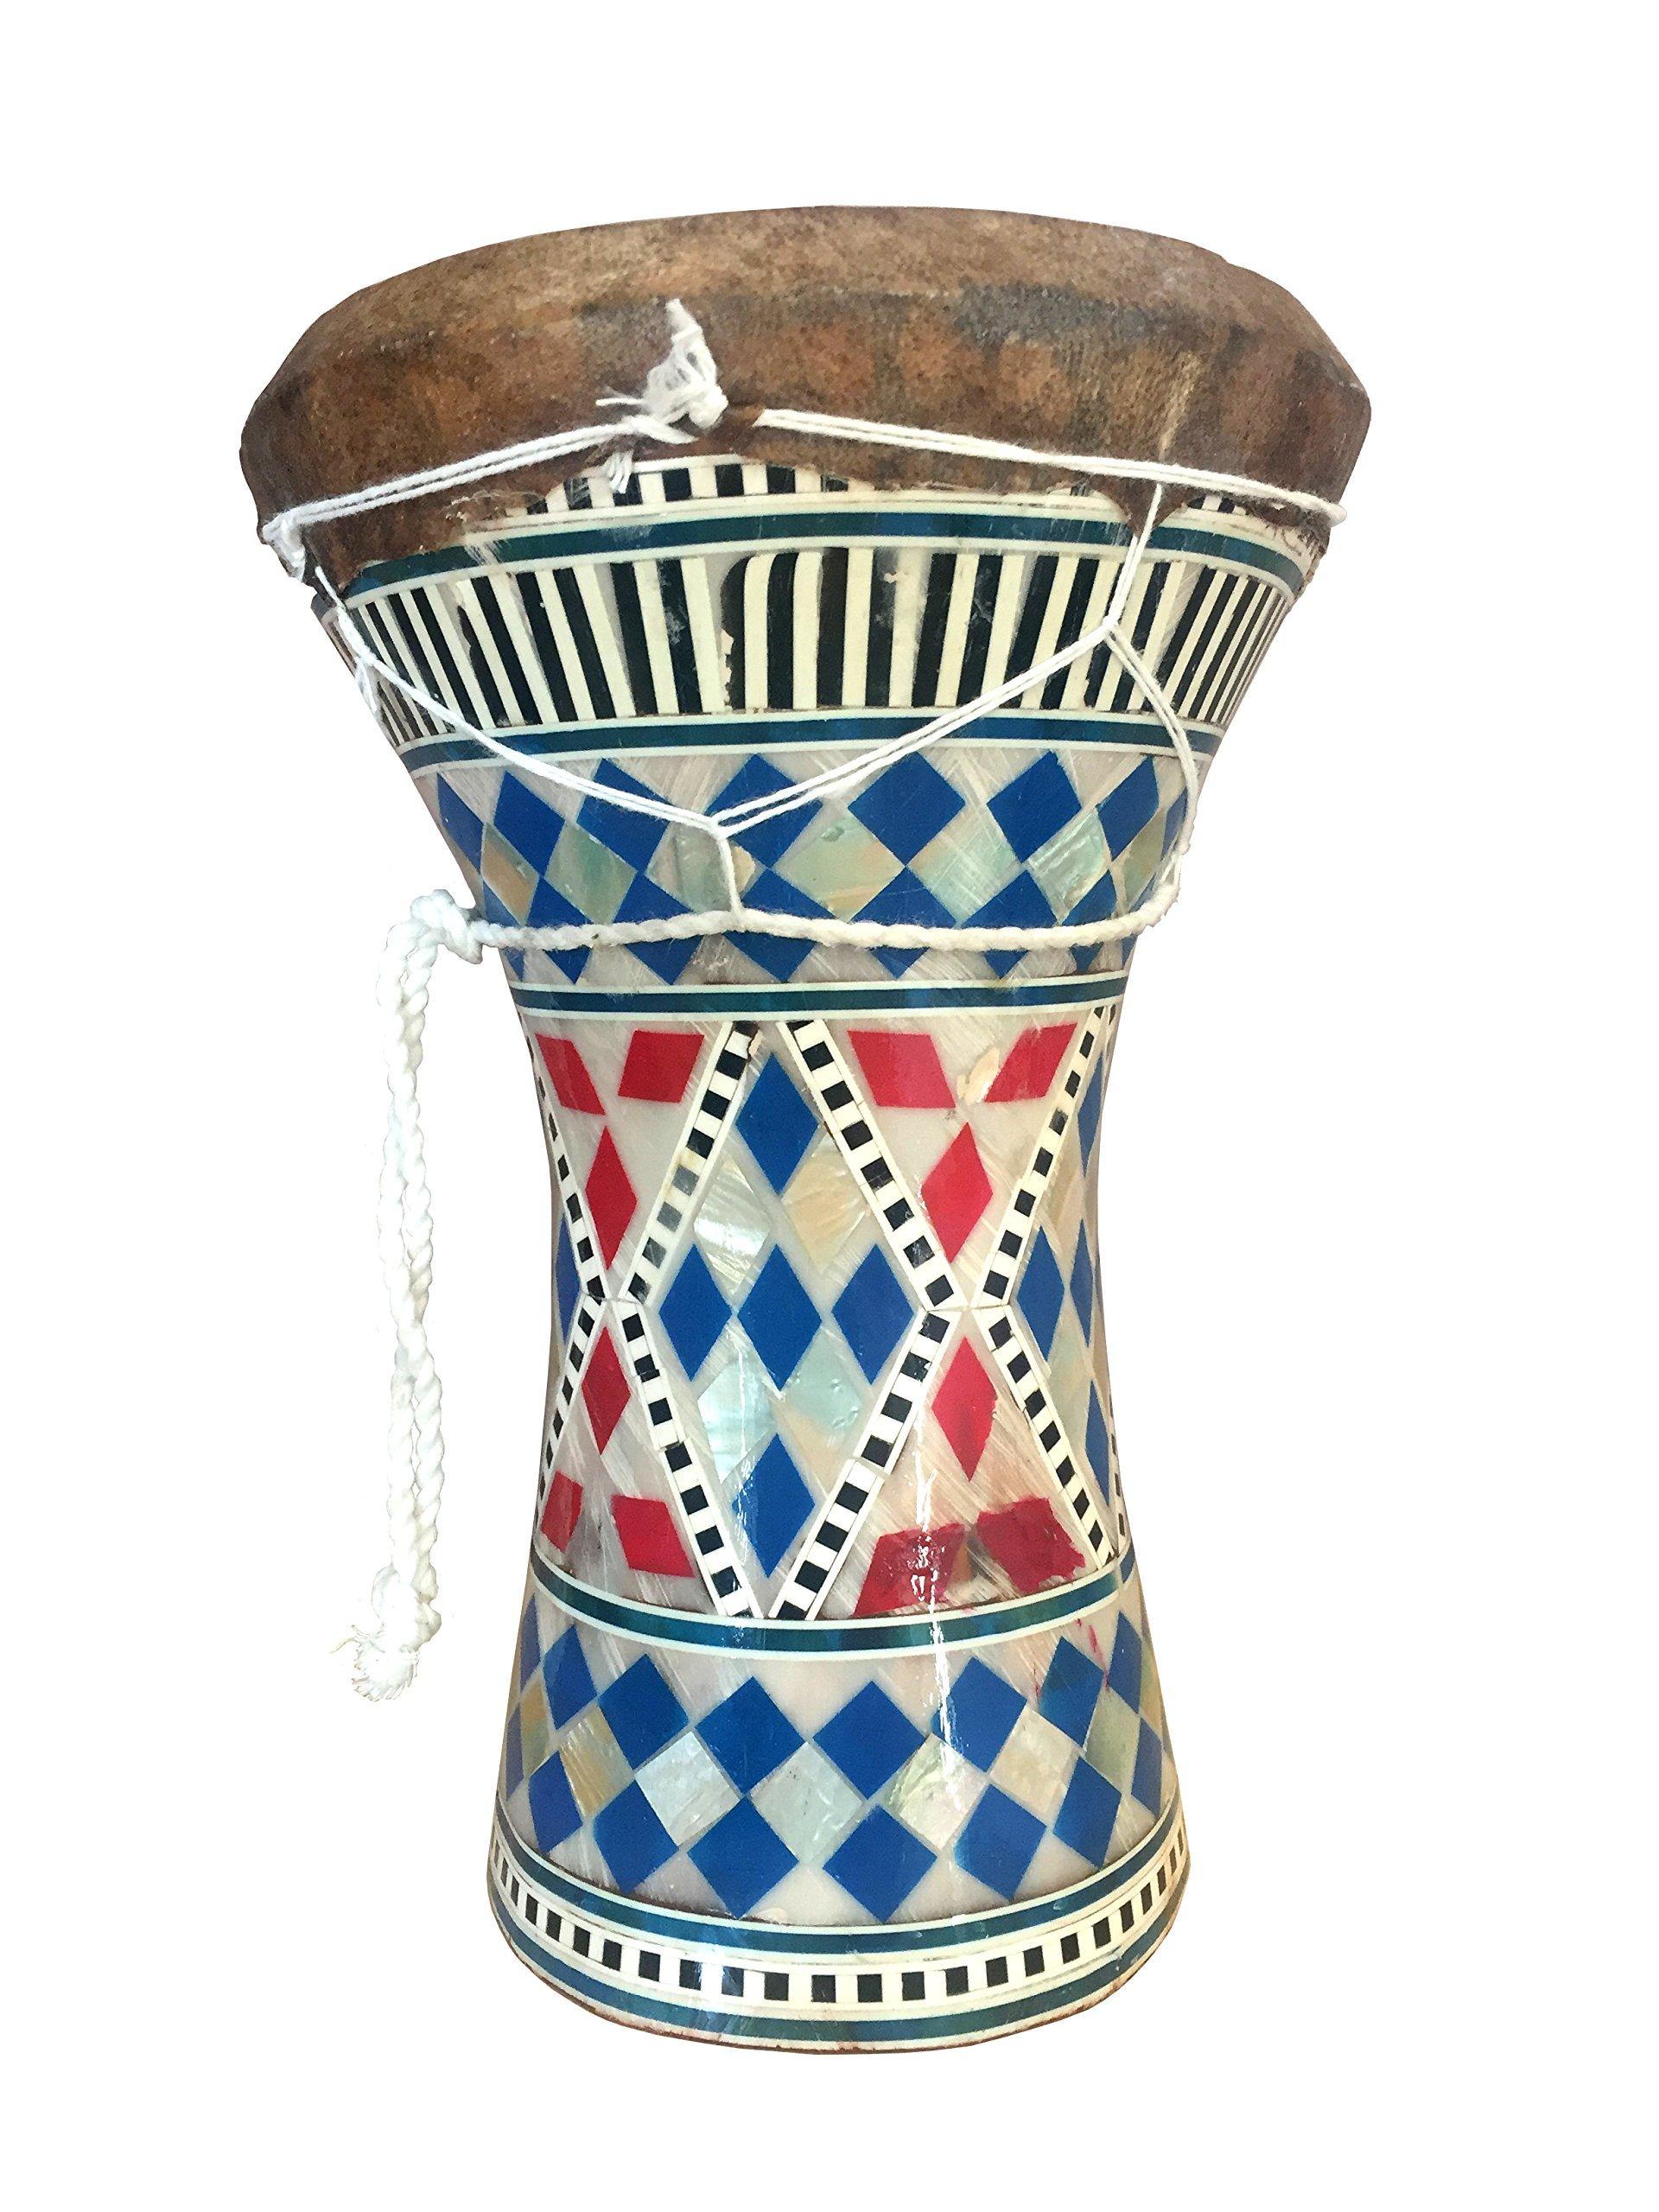 Mosaic Mother of Pearl Darbuka Drum Doumbek 8.5'' high by Jerusalem Drums